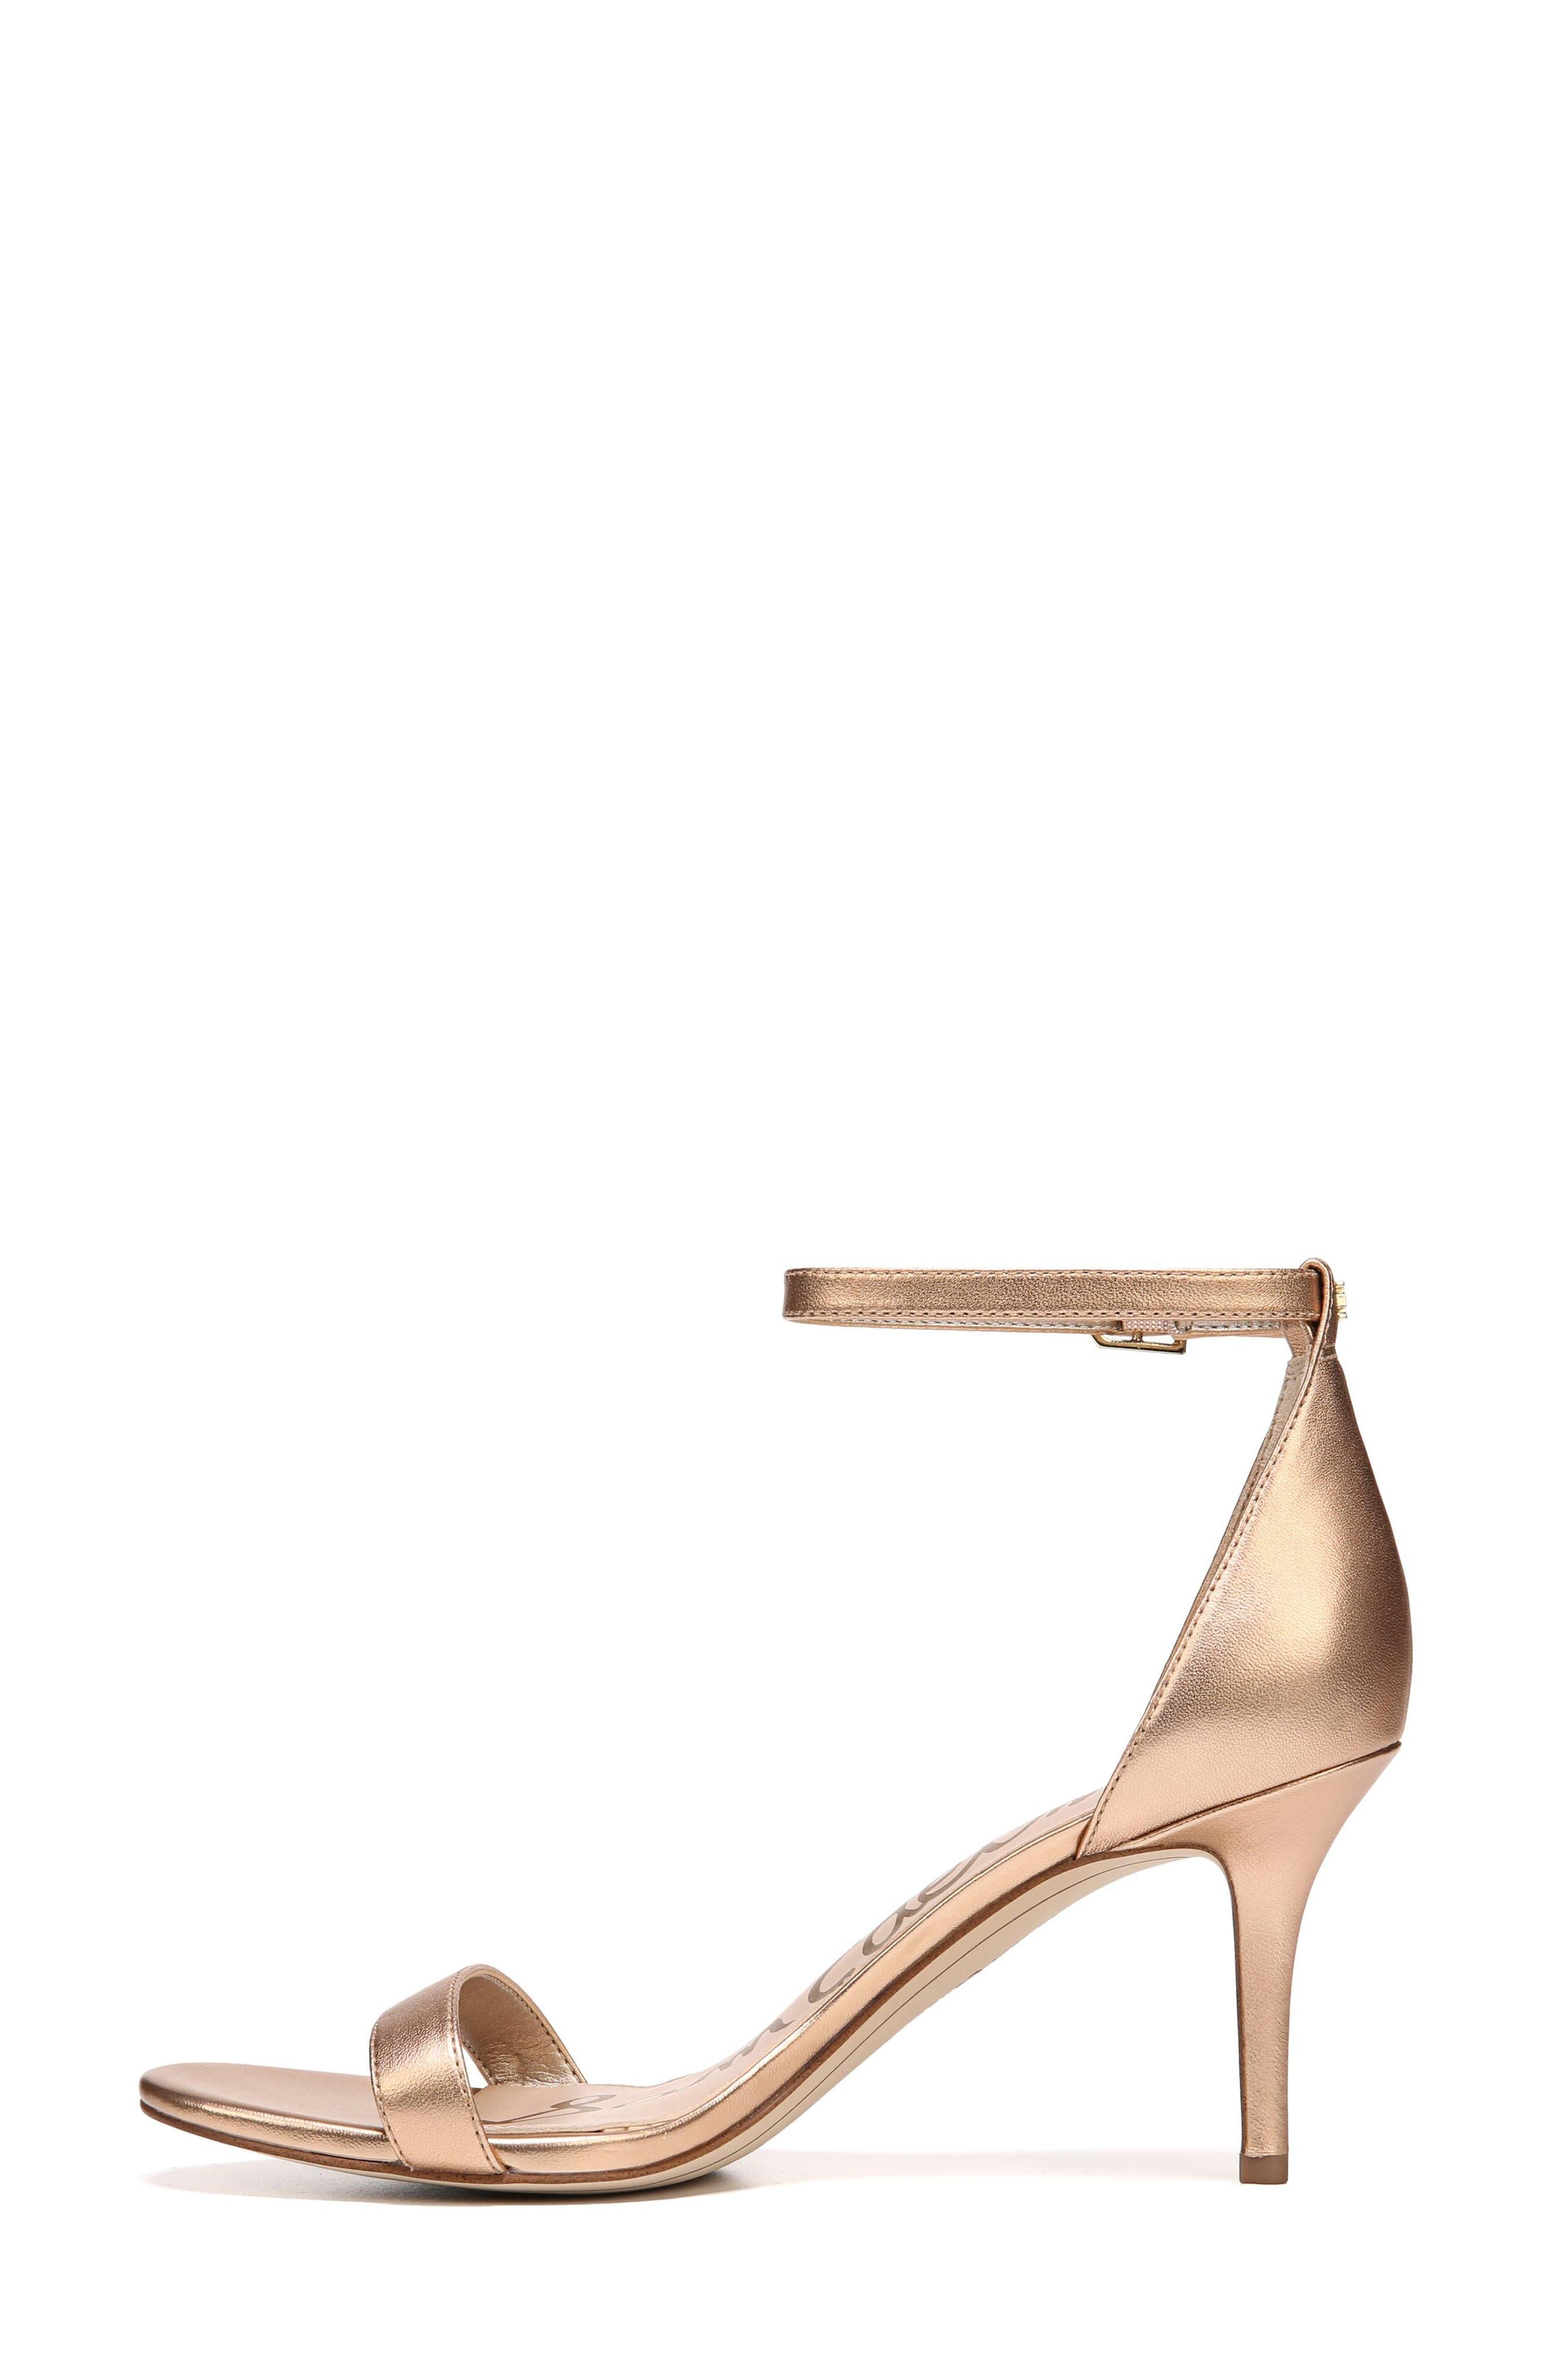 ,                             'Patti' Ankle Strap Sandal,                             Alternate thumbnail 73, color,                             221